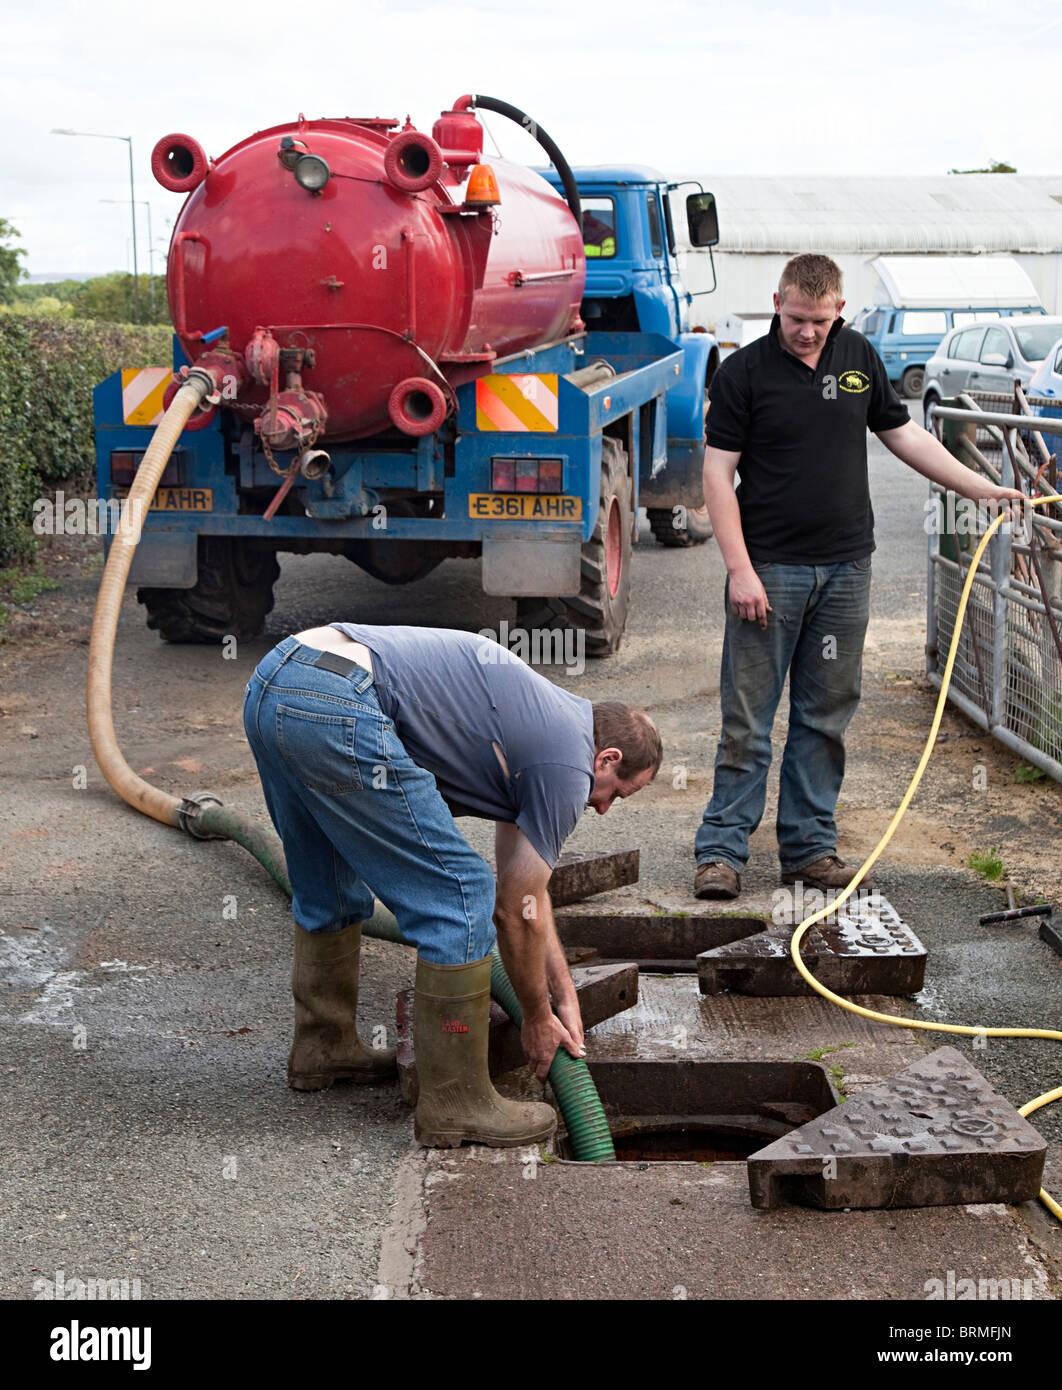 Nettoyage vidange Talgarth Wales UK Photo Stock